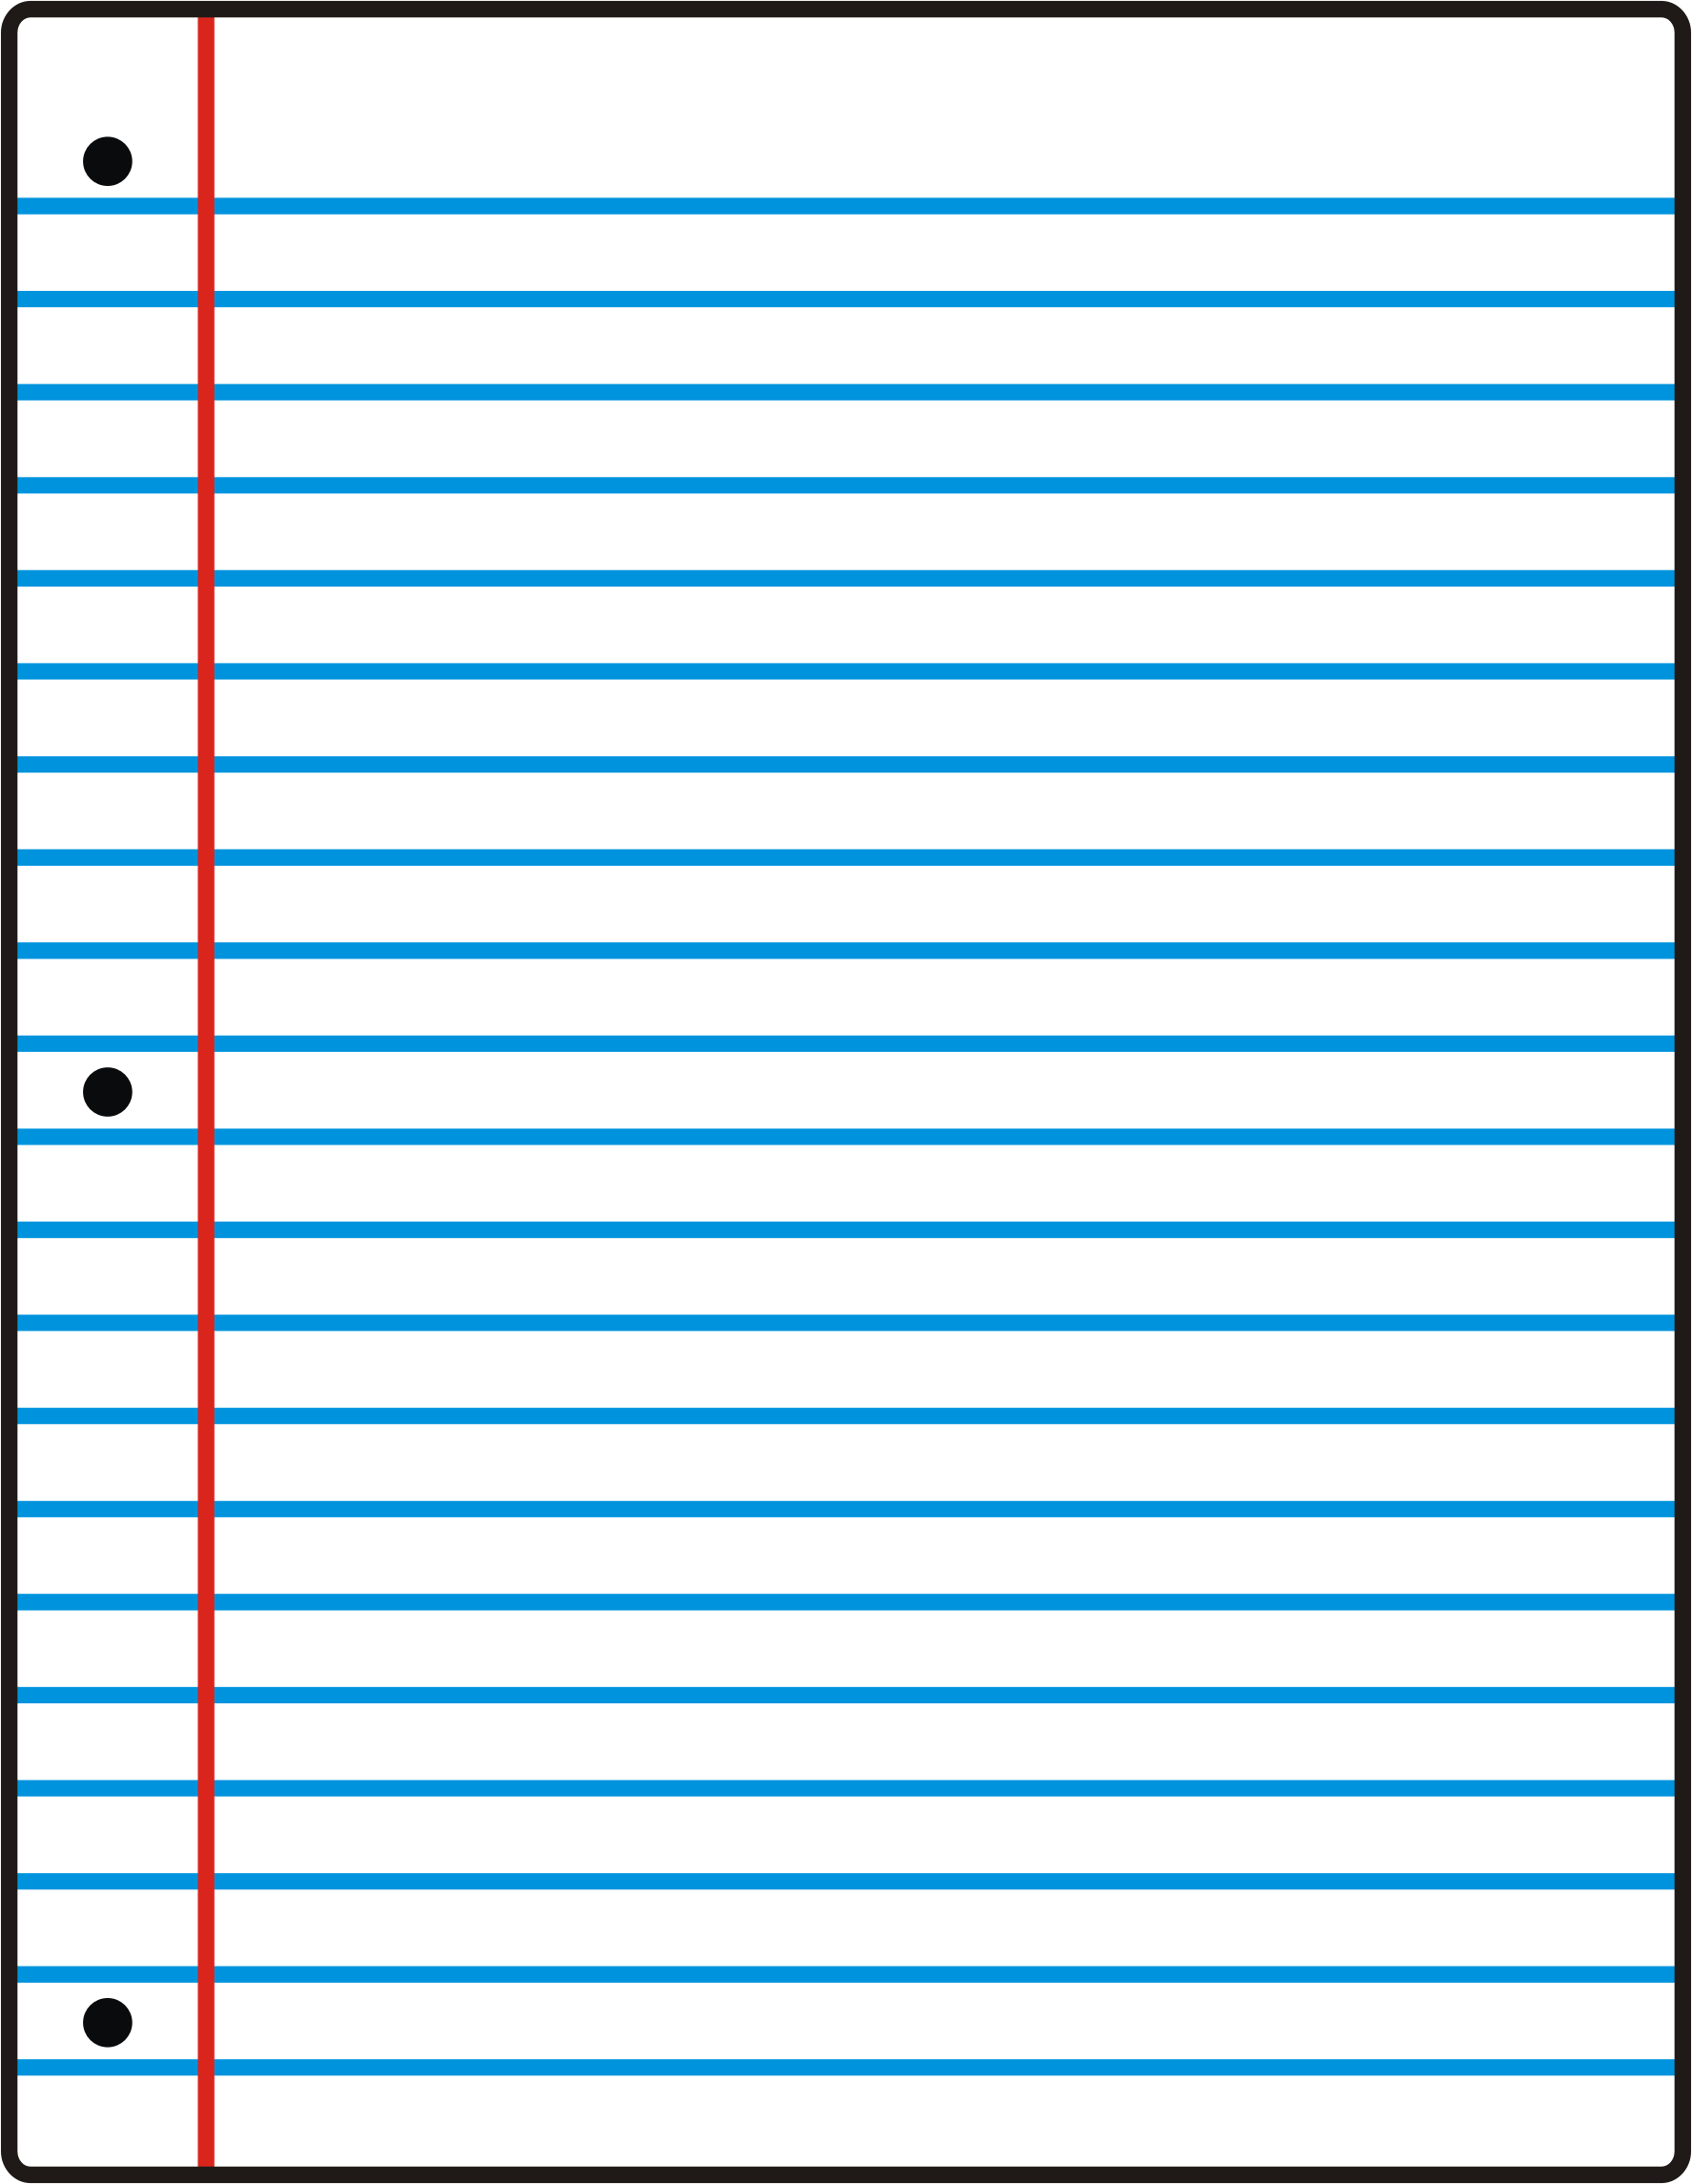 Lined Paper Transparent : lined, paper, transparent, Paper, Clipart, Lined, Paper,, Transparent, Download, WebStockReview